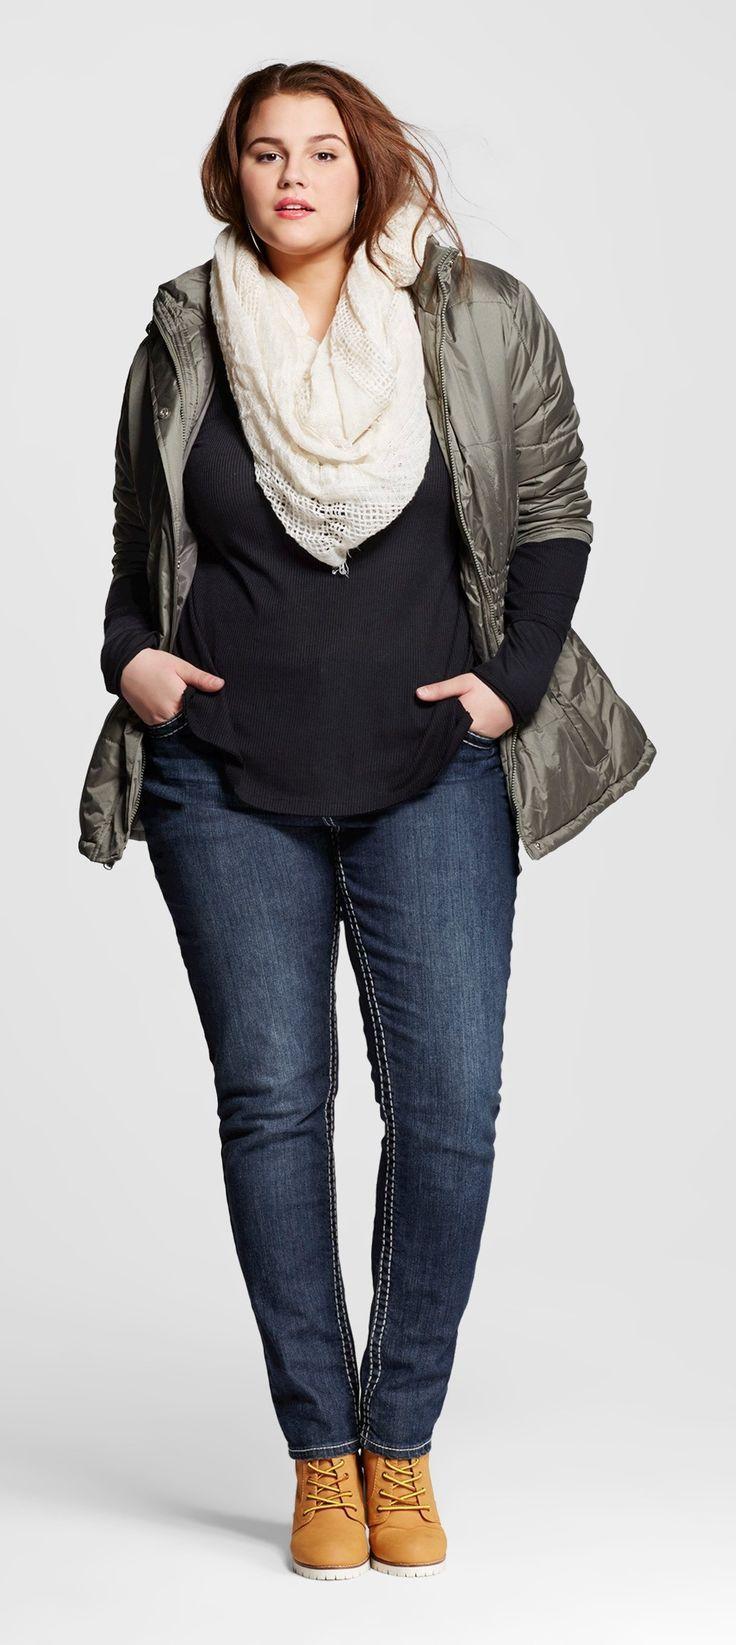 بالصور صور بنات سمينات , صور جميلات الوزن الزائد 4282 9